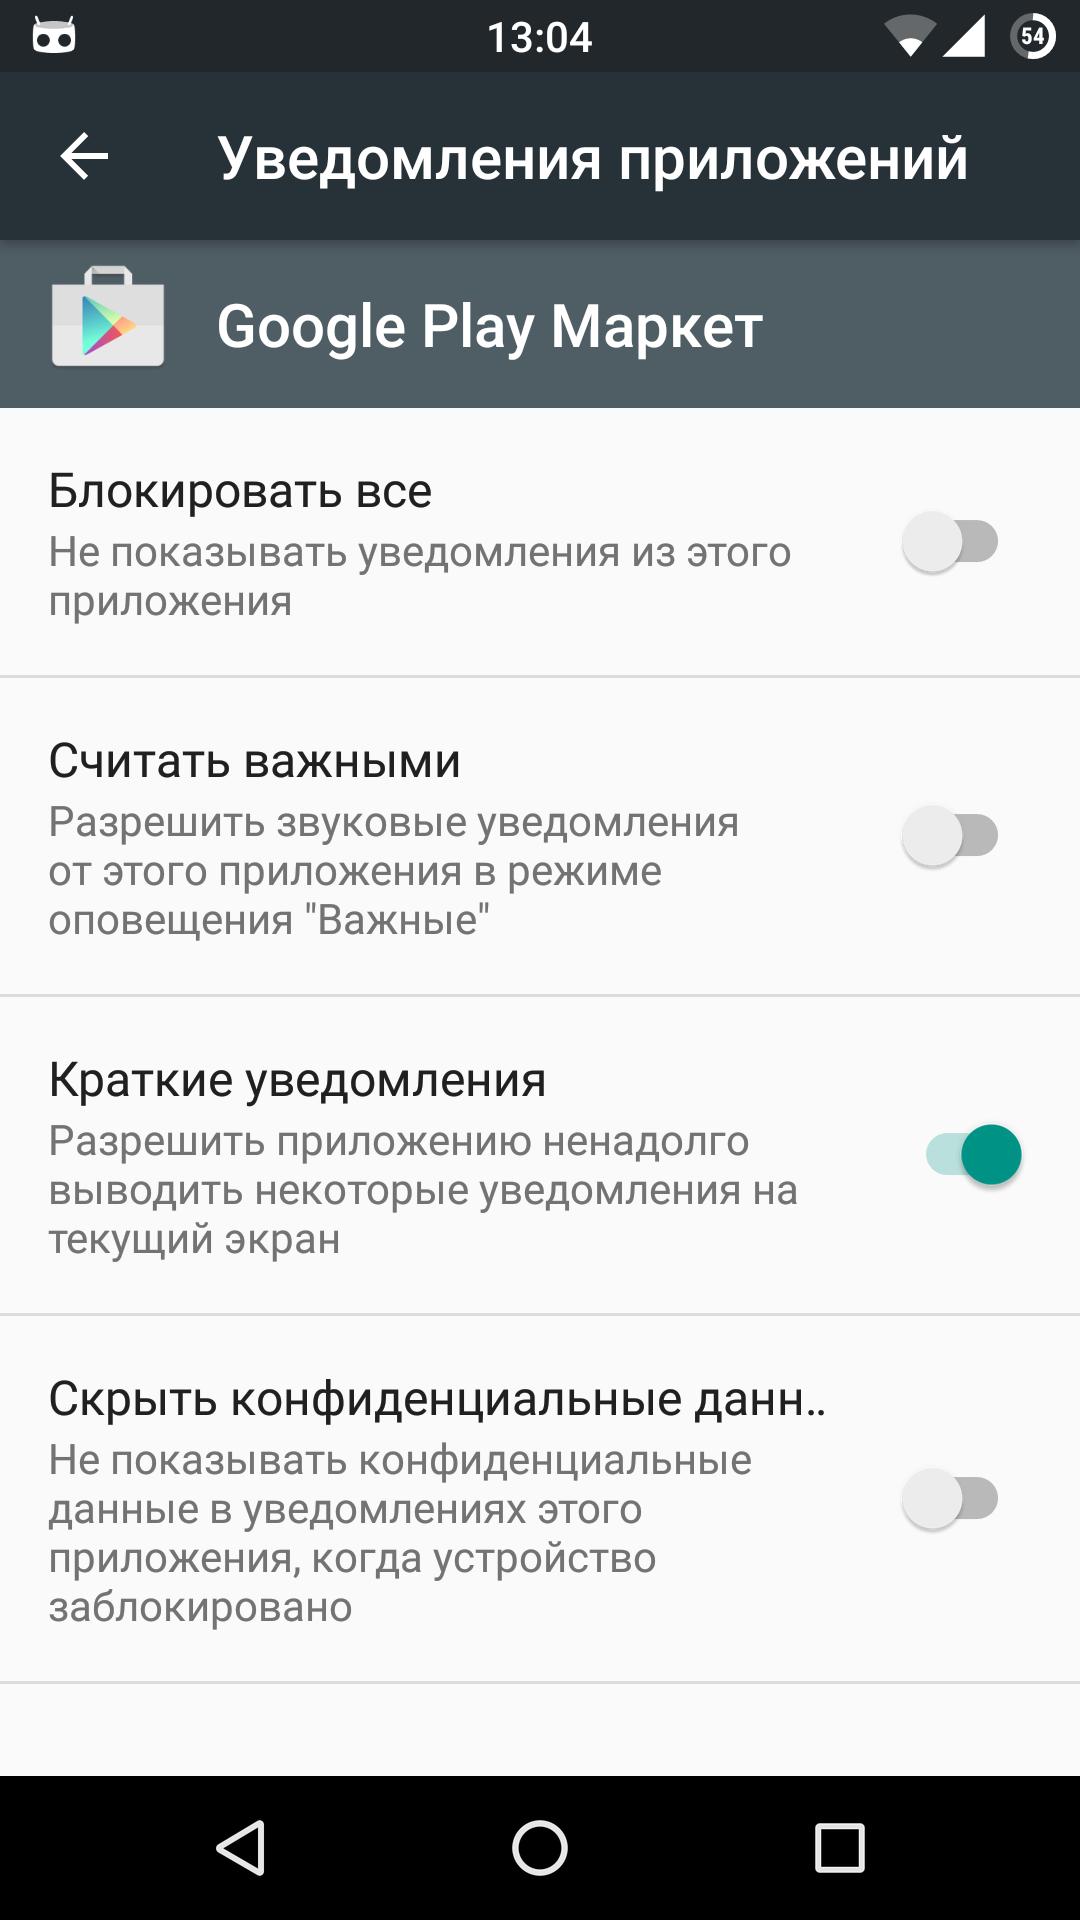 Настройки уведомлений Google Play Маркет